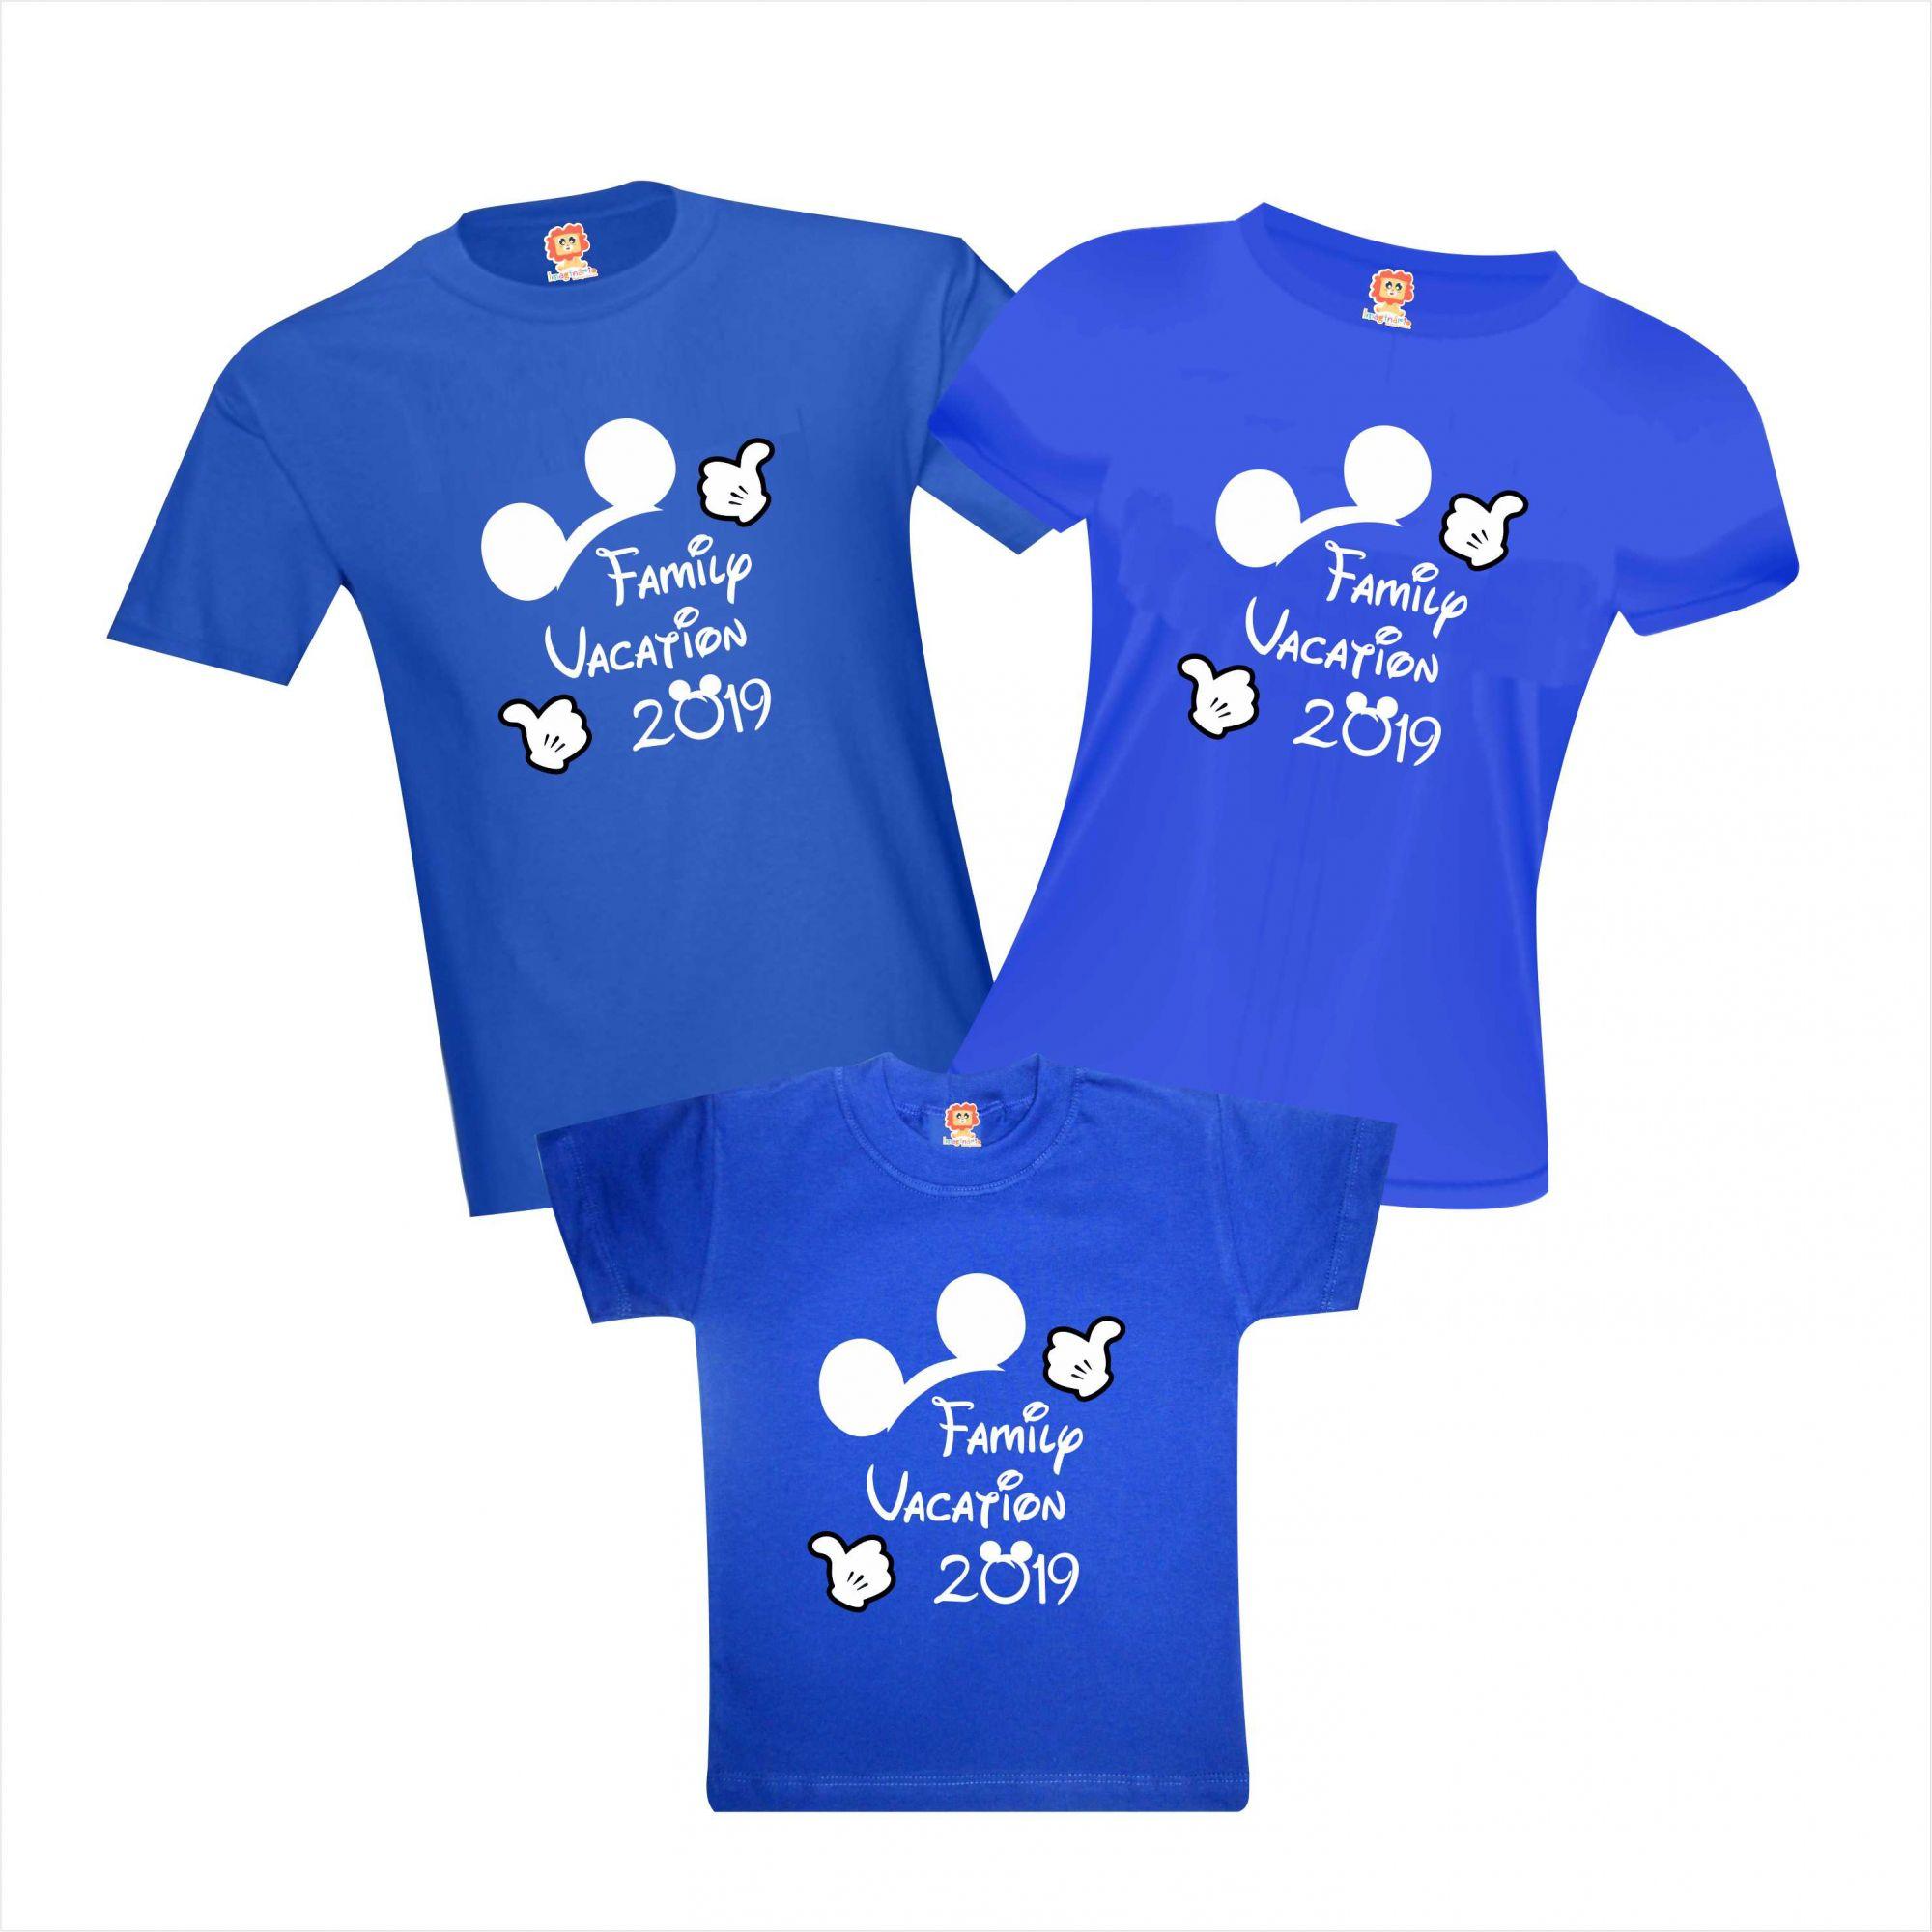 Camisetas Viagem Disney Mickey Orlando Family Vacation Personalizadas